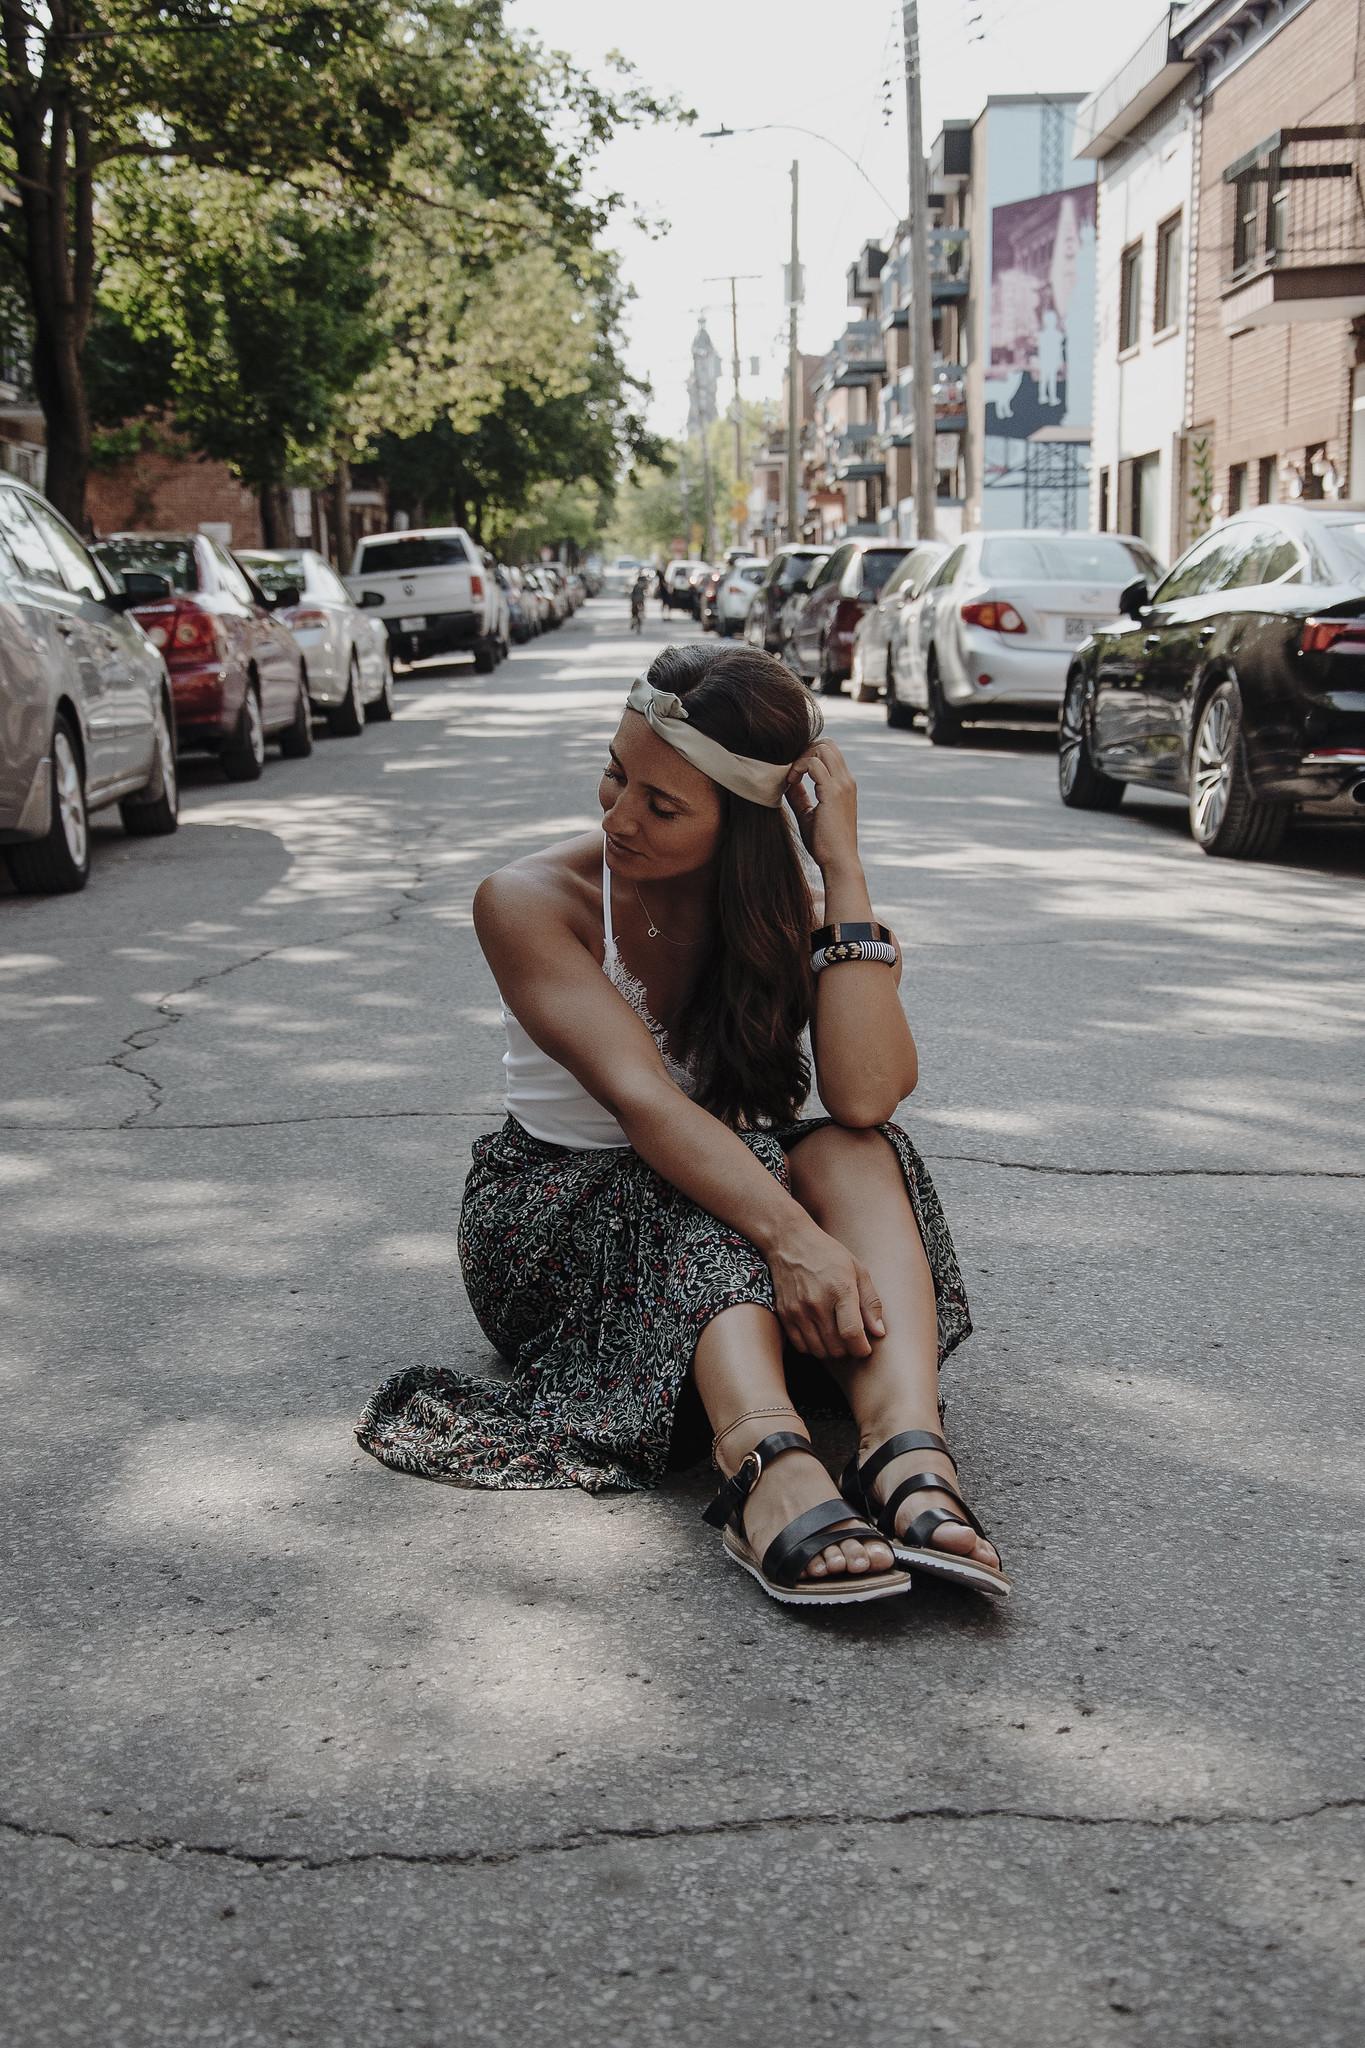 camille dg jupe longue rue assise